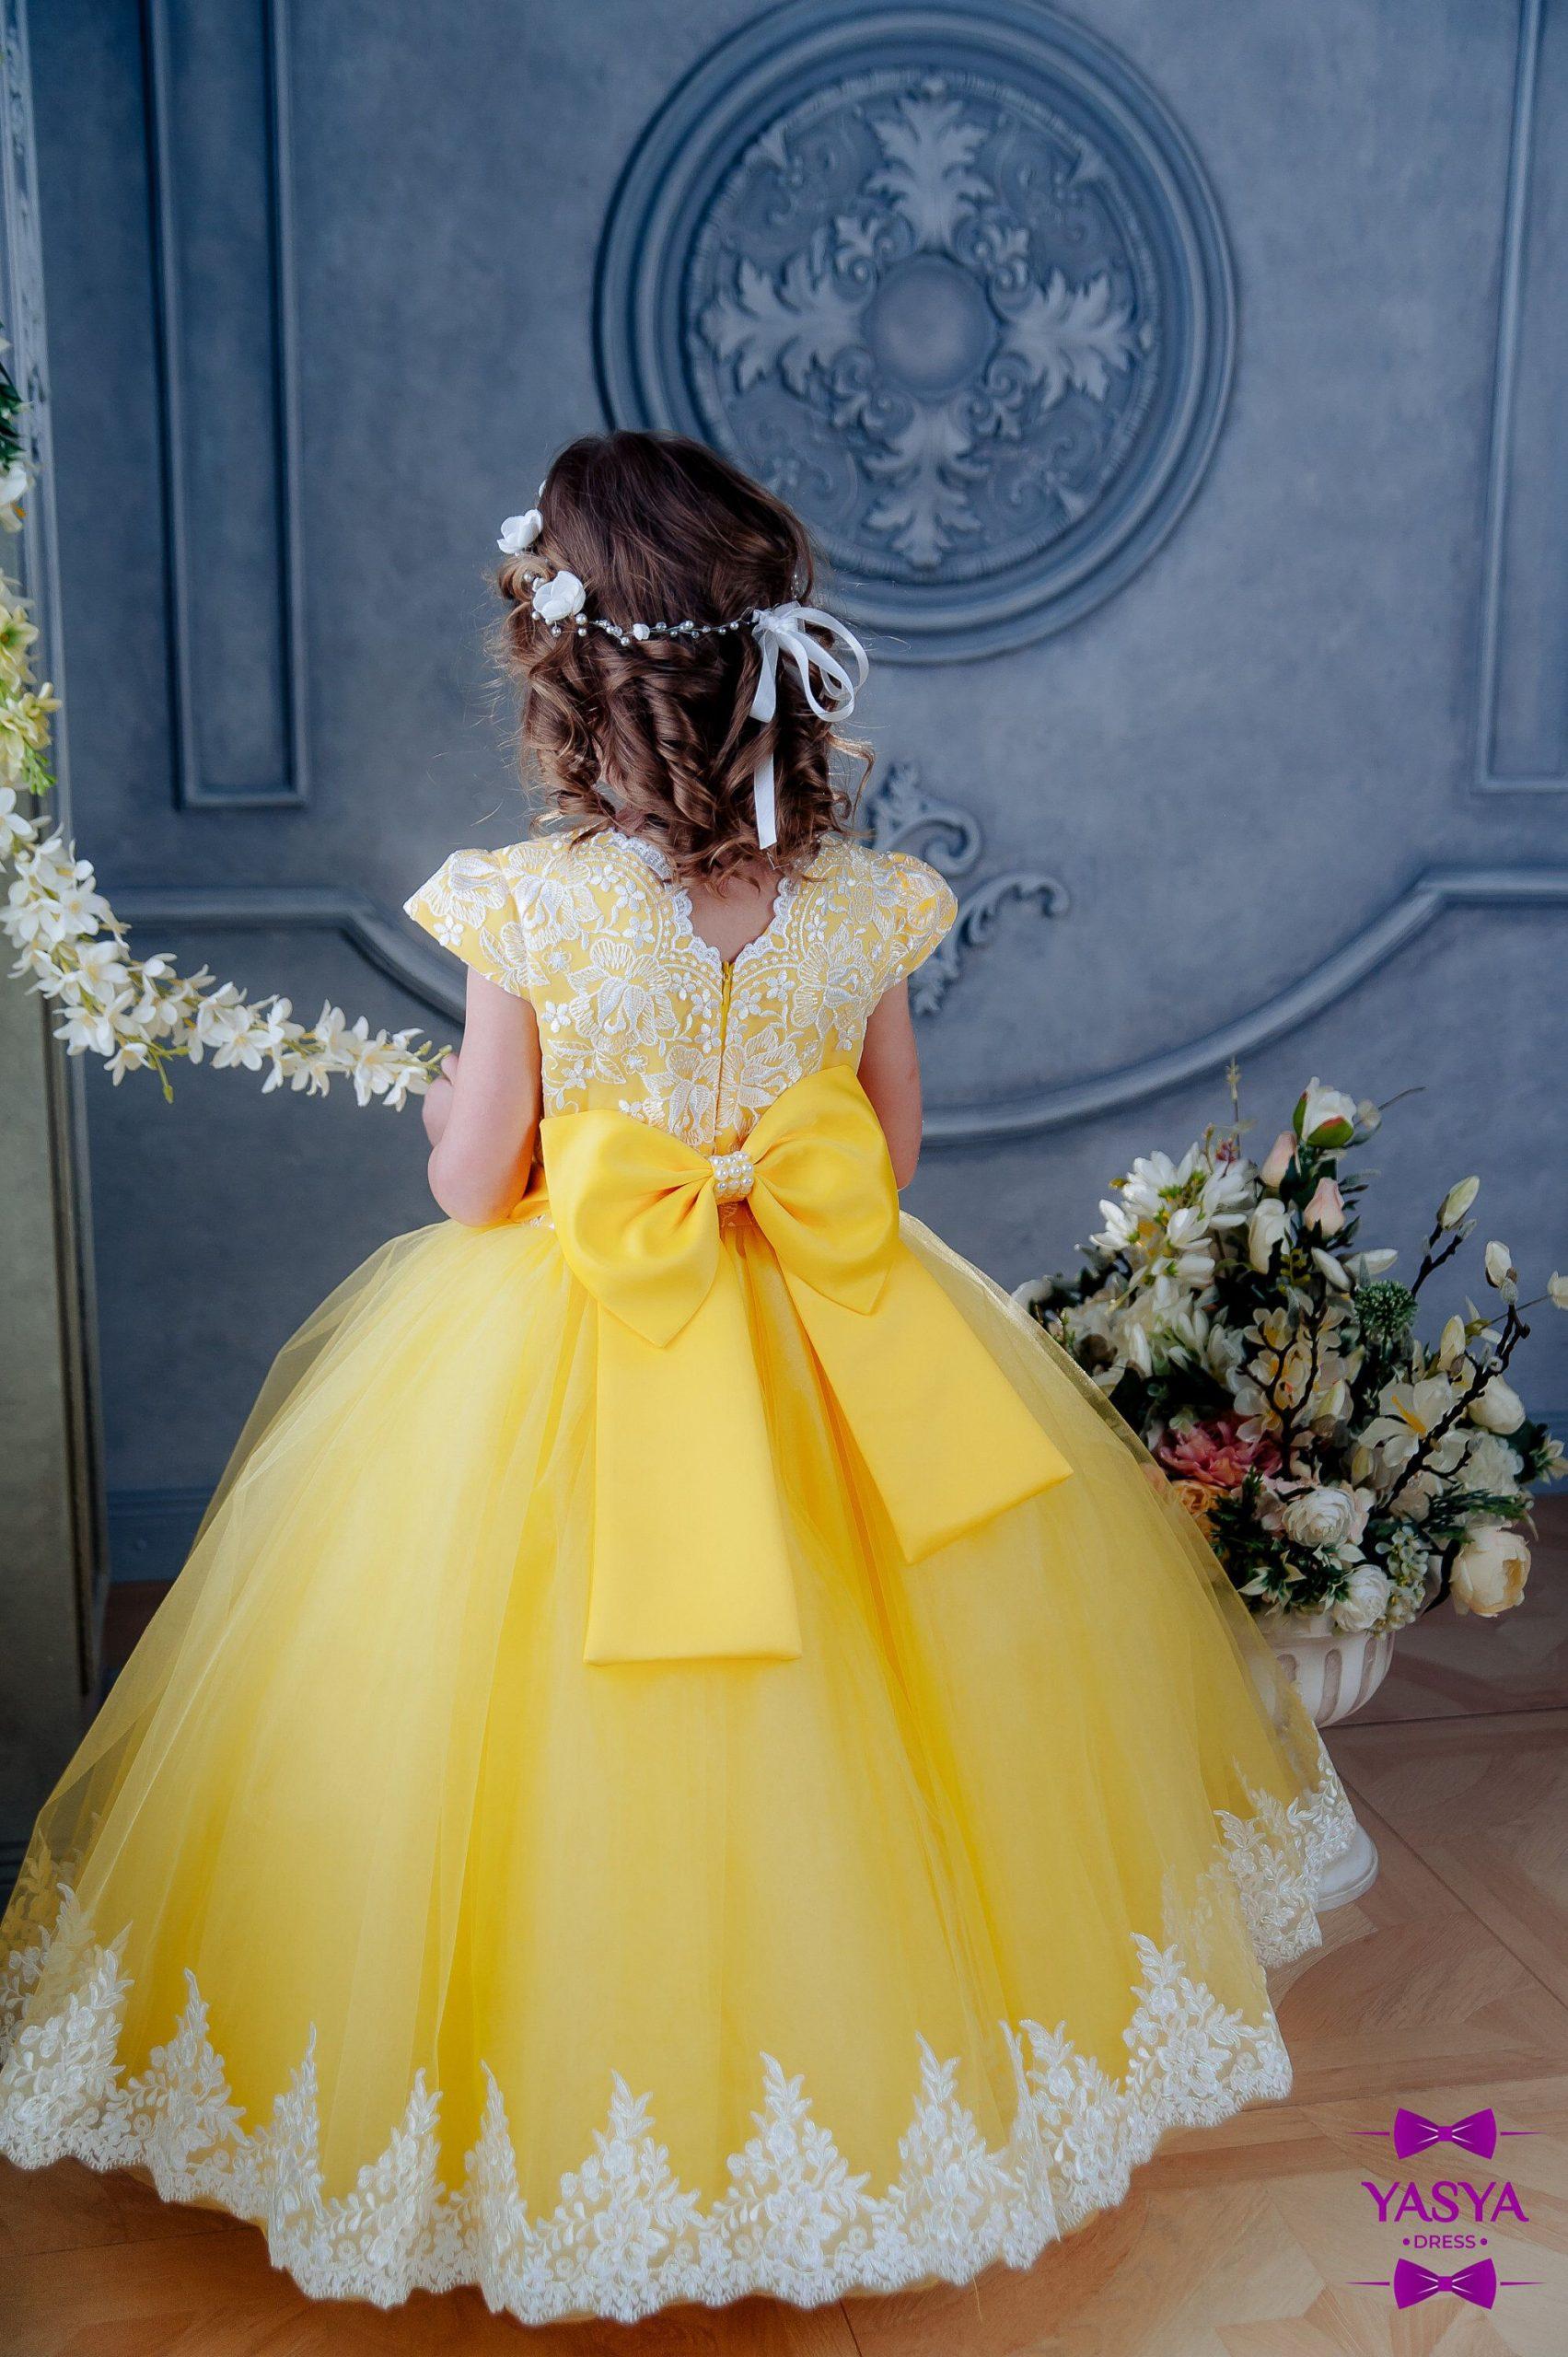 Park Art My WordPress Blog_Yellow Flower Girl Dress Toddler